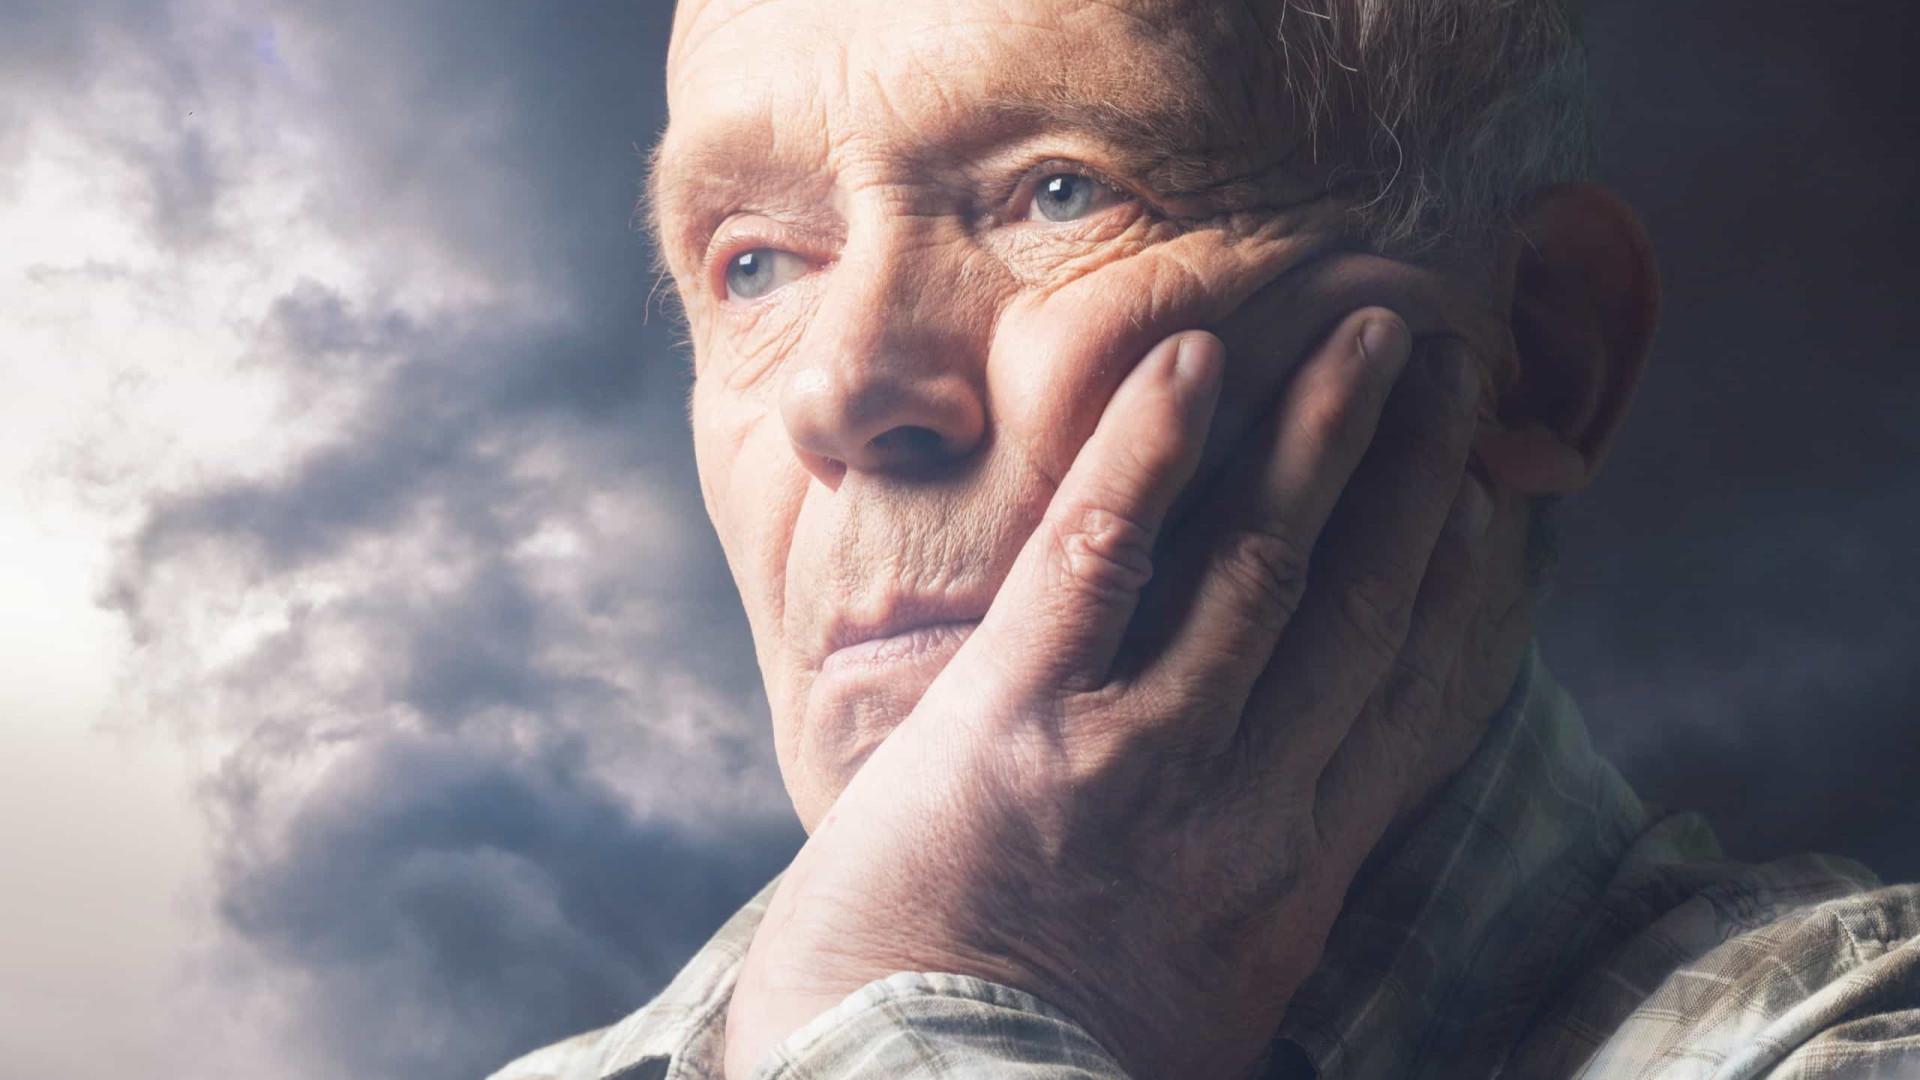 Os dez primeiros sintomas de demência. Fique atento